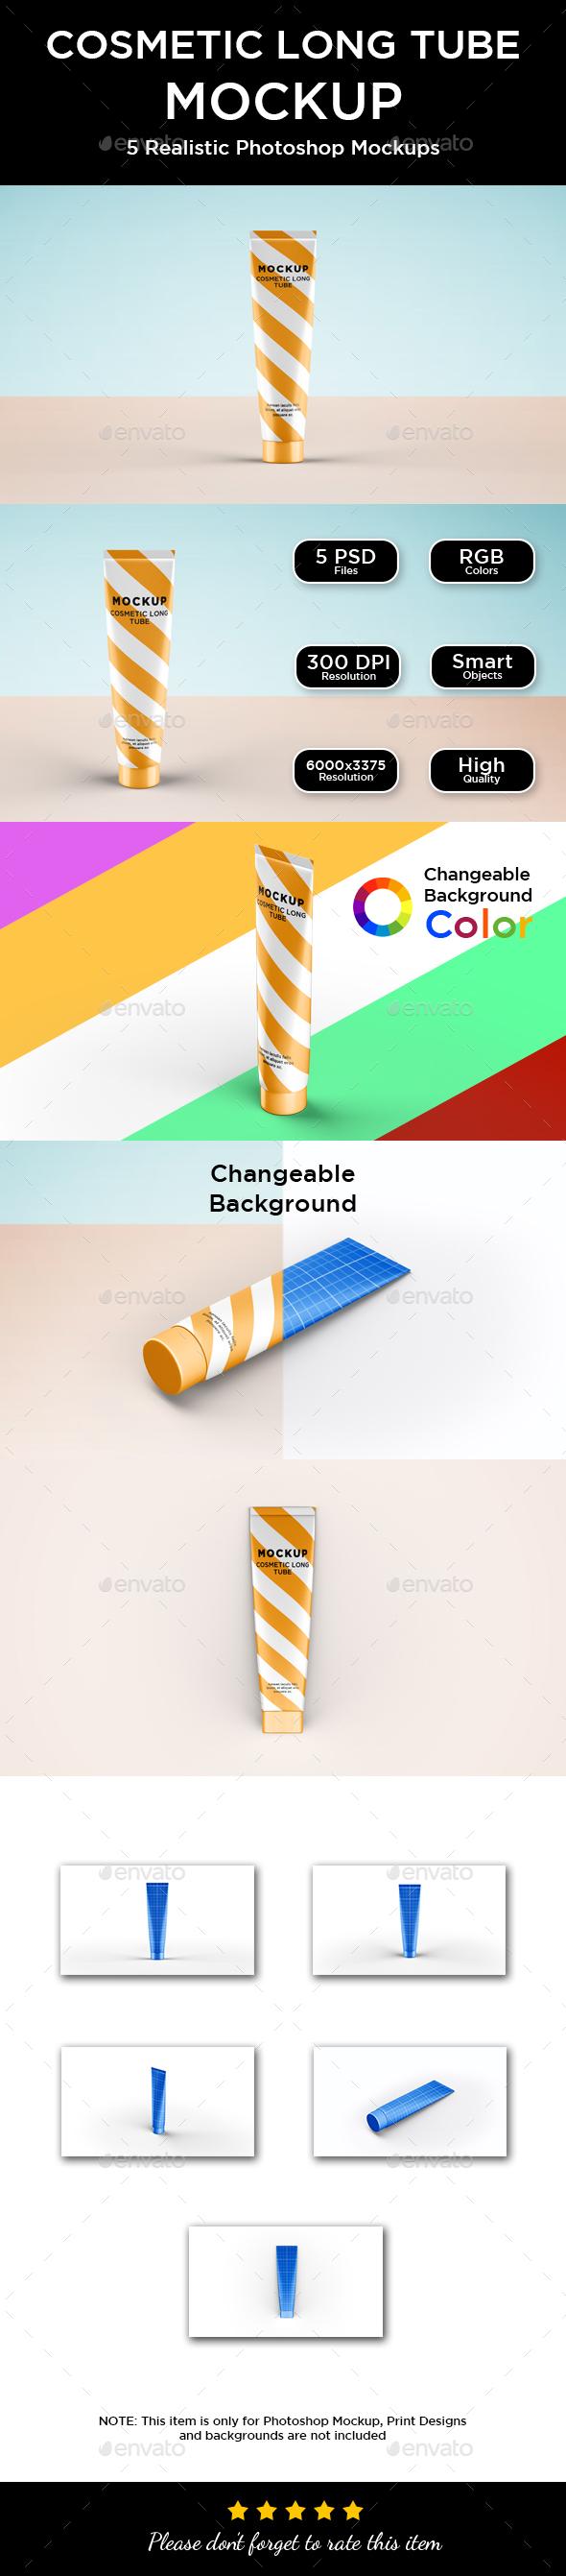 Cosmetic Tube Mockup - Long - Packaging Product Mock-Ups